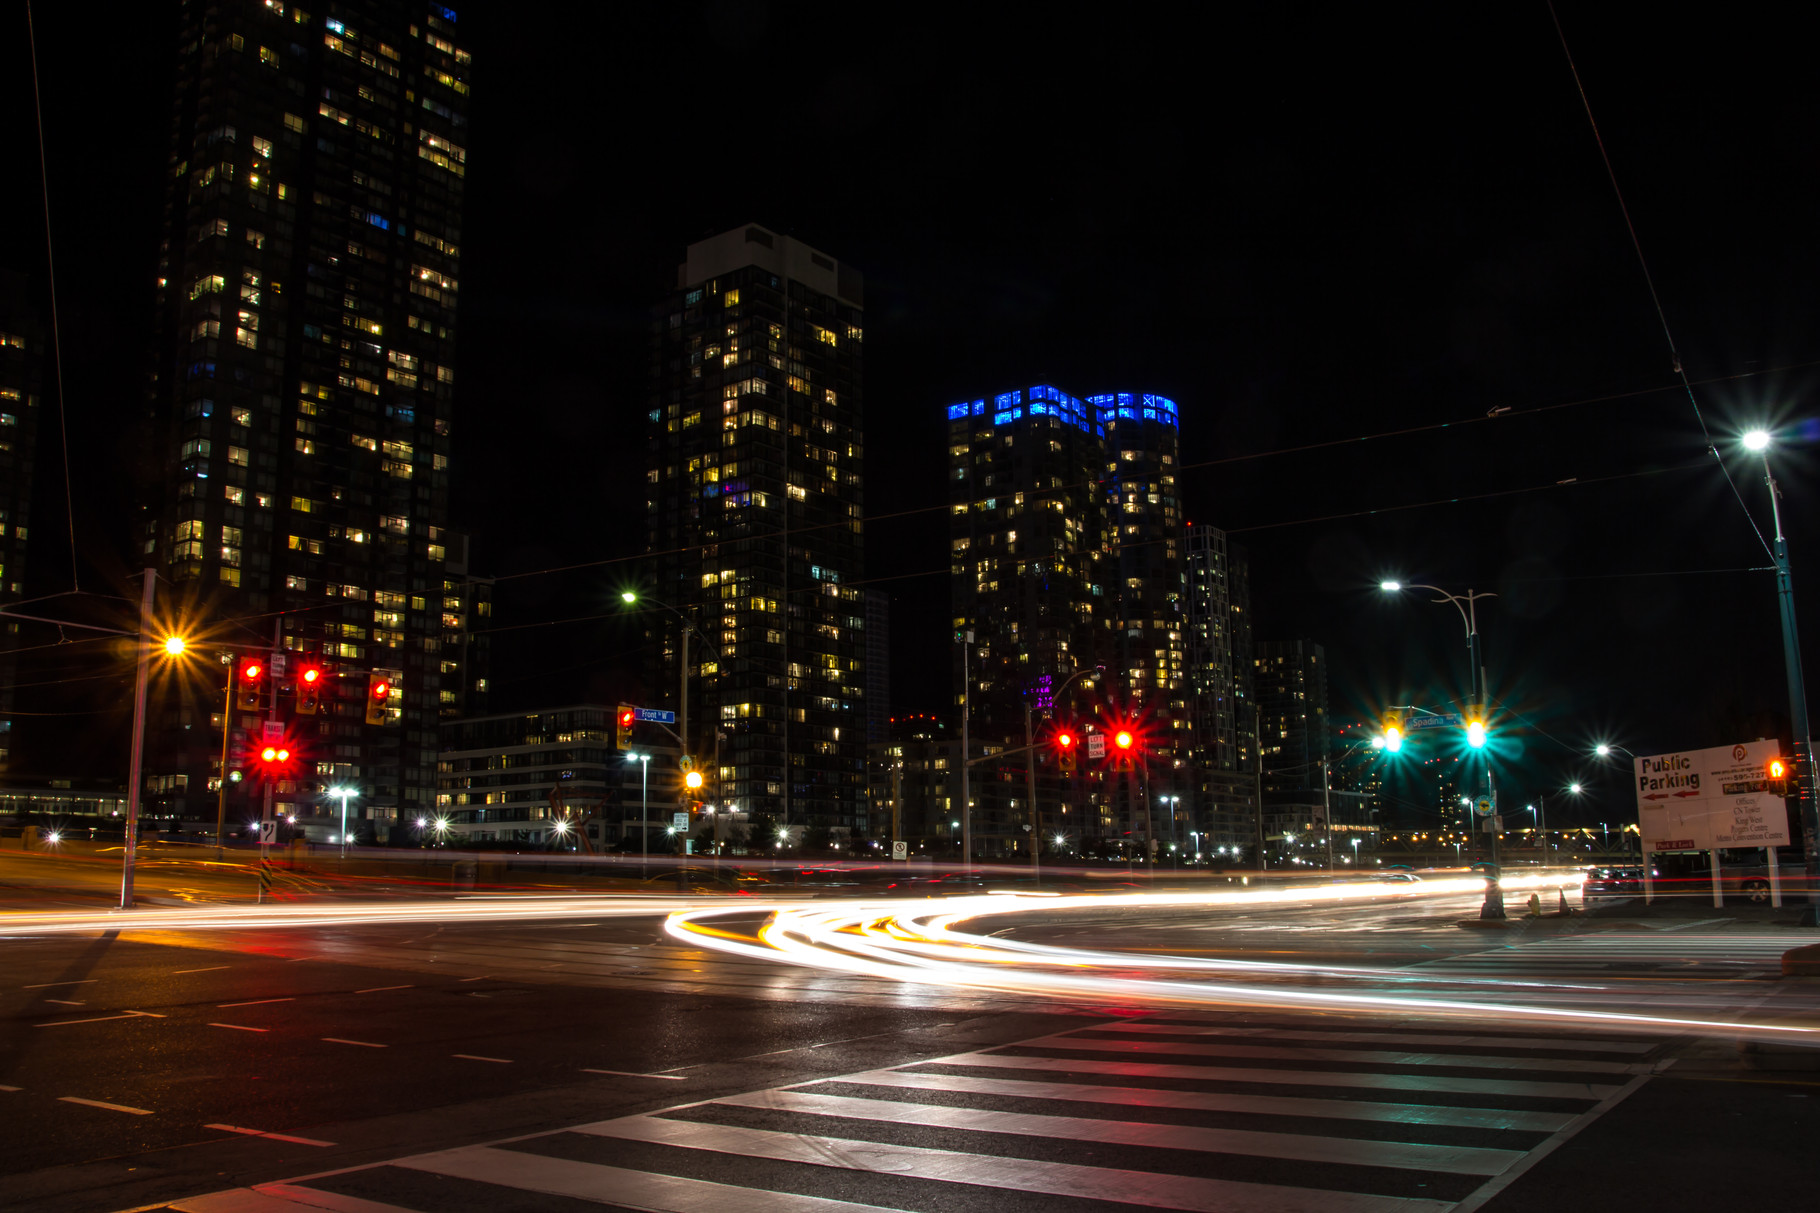 17_Toronto bei Nacht.